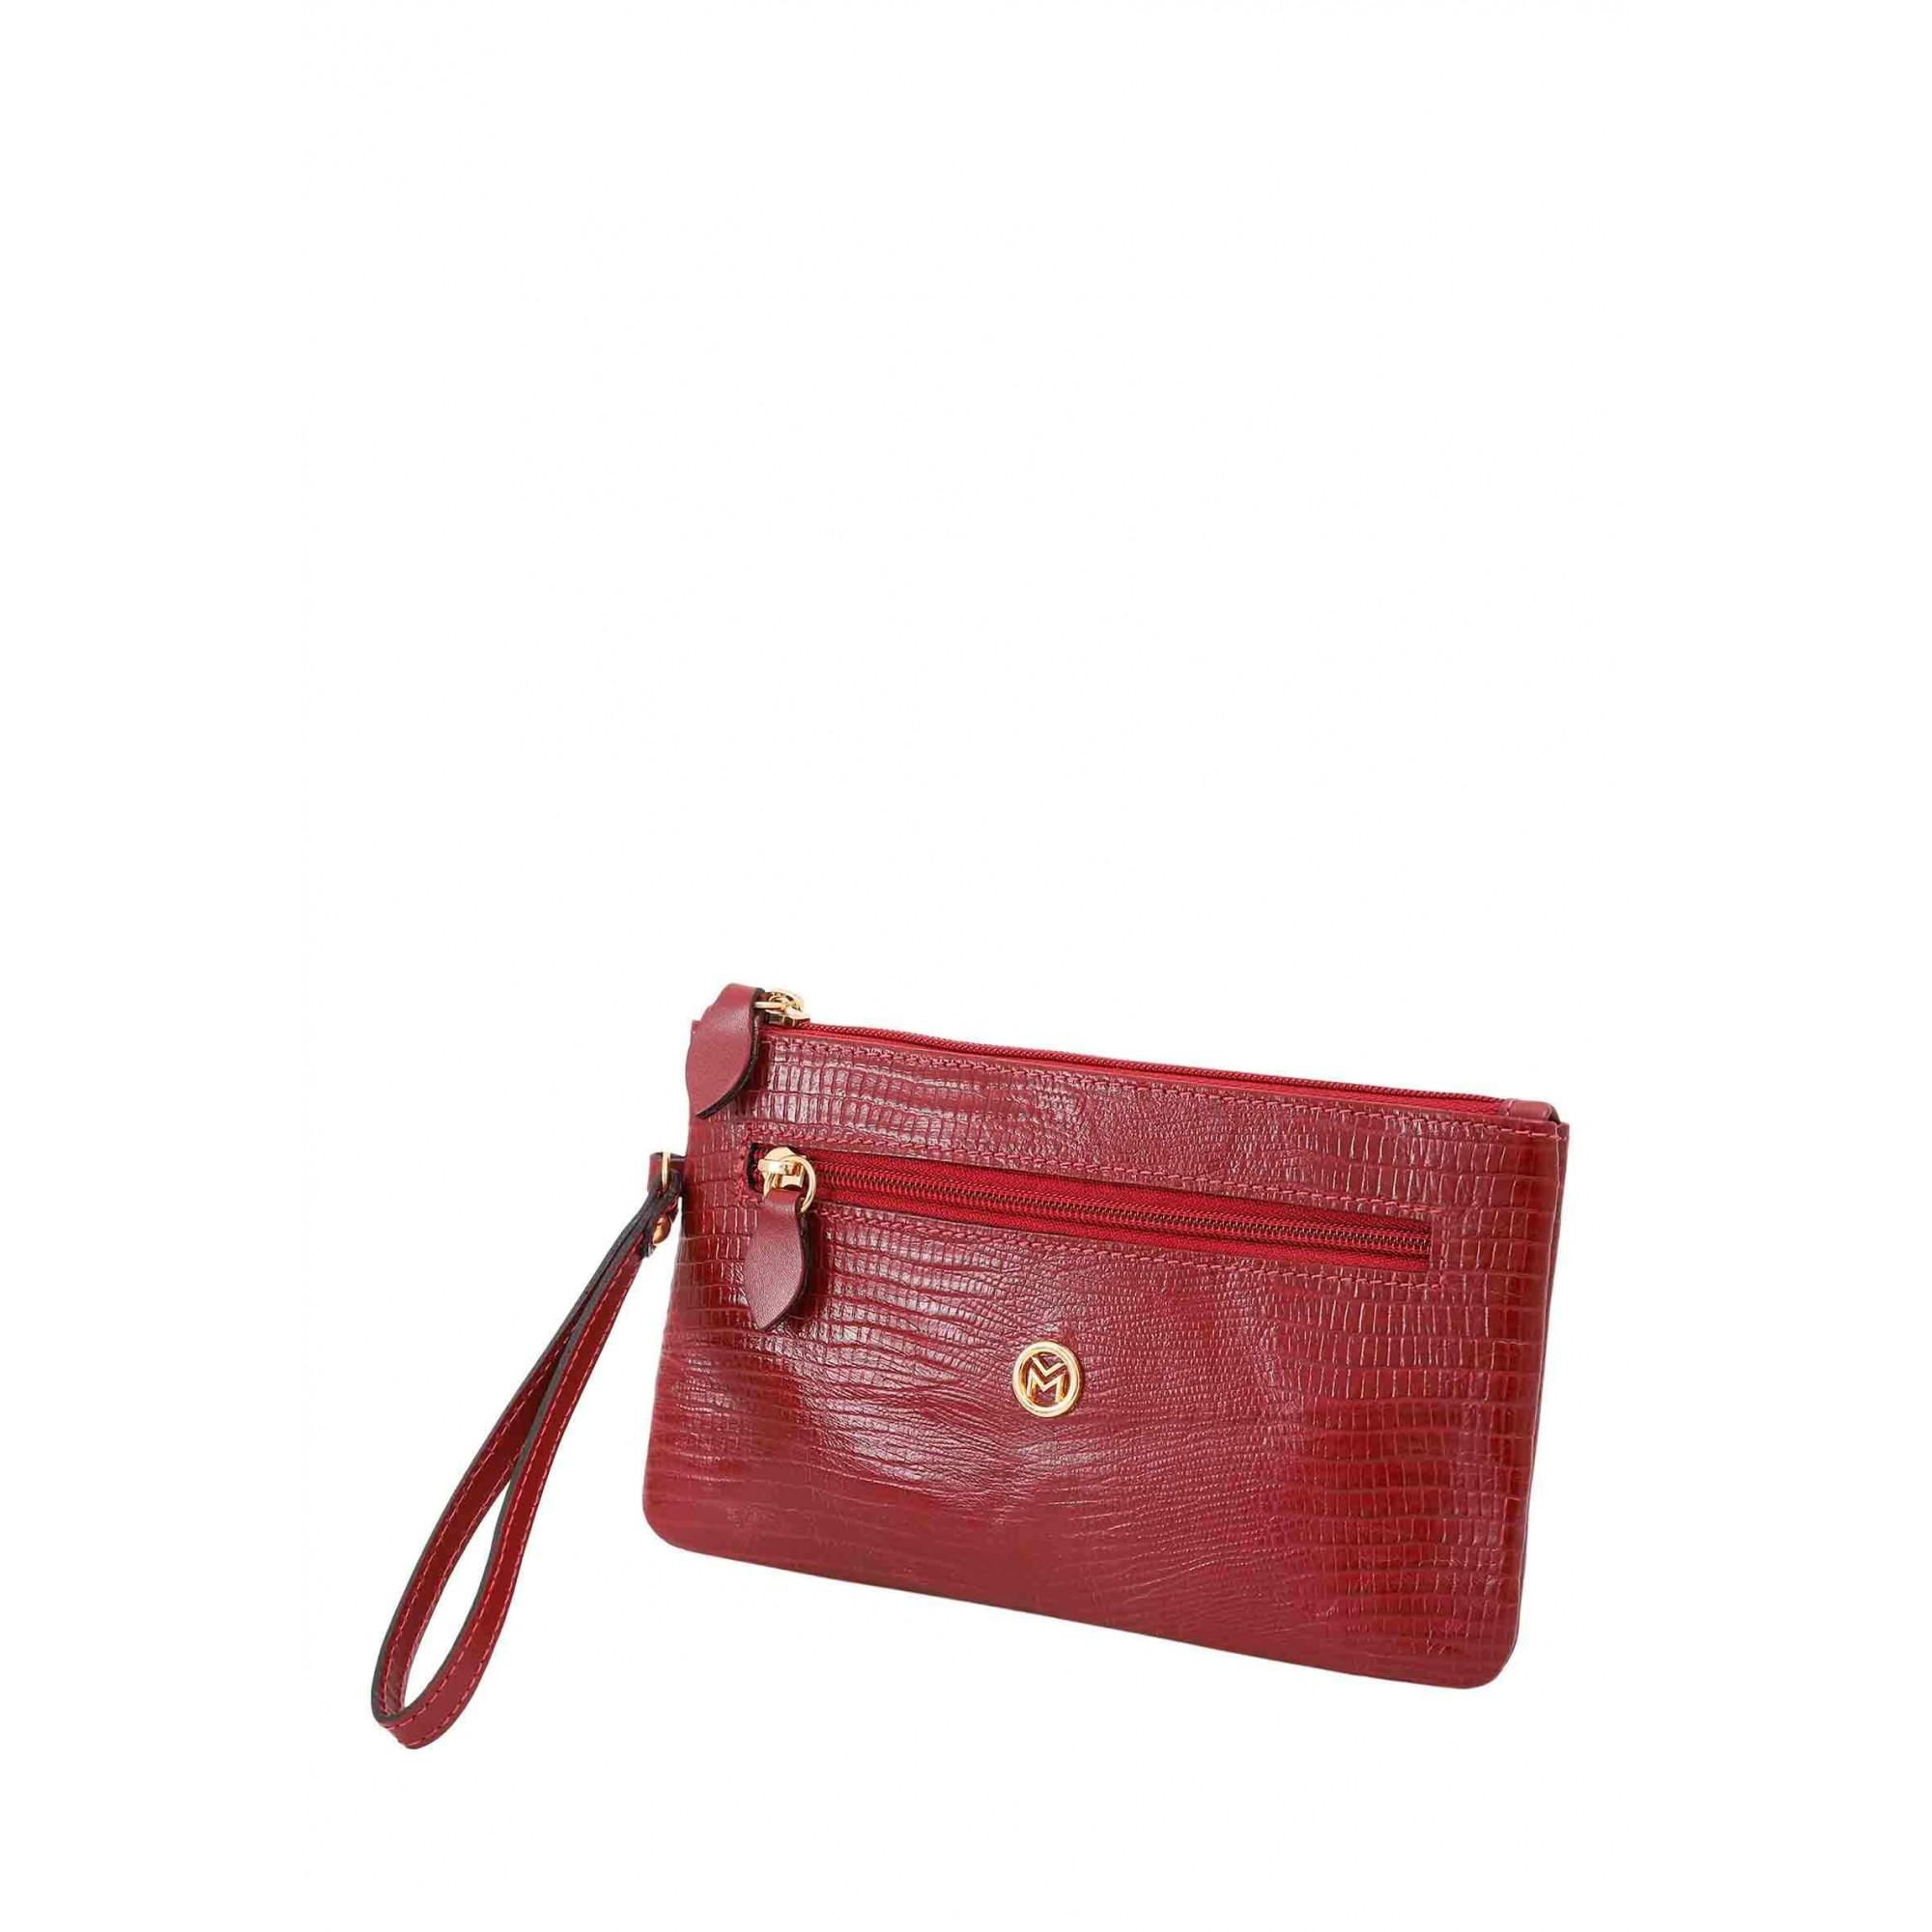 Bolsa Carteira Clutch Couro Mariart 261L